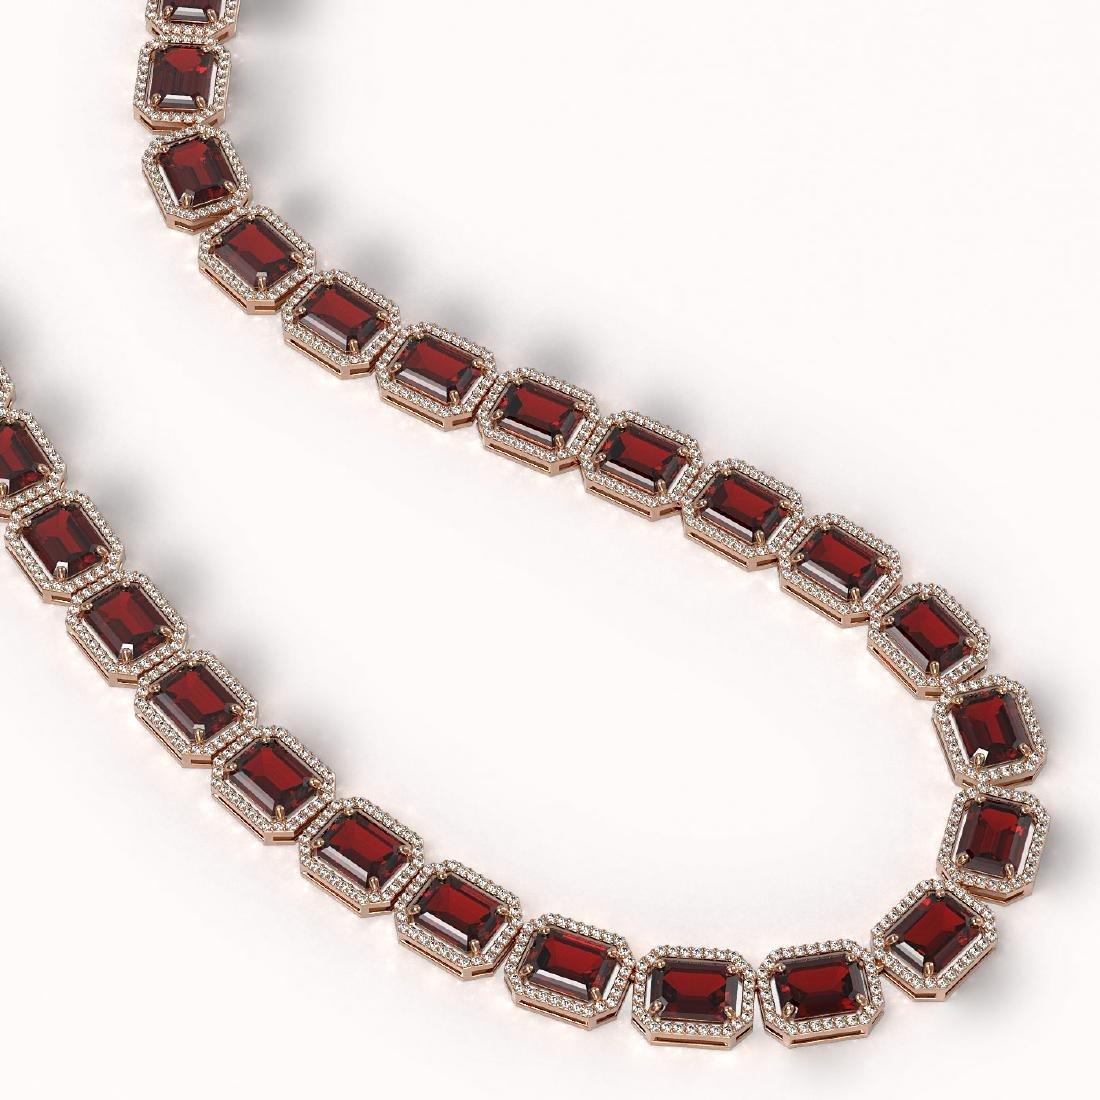 73.44 CTW Garnet & Diamond Halo Necklace 10K Rose Gold - 2